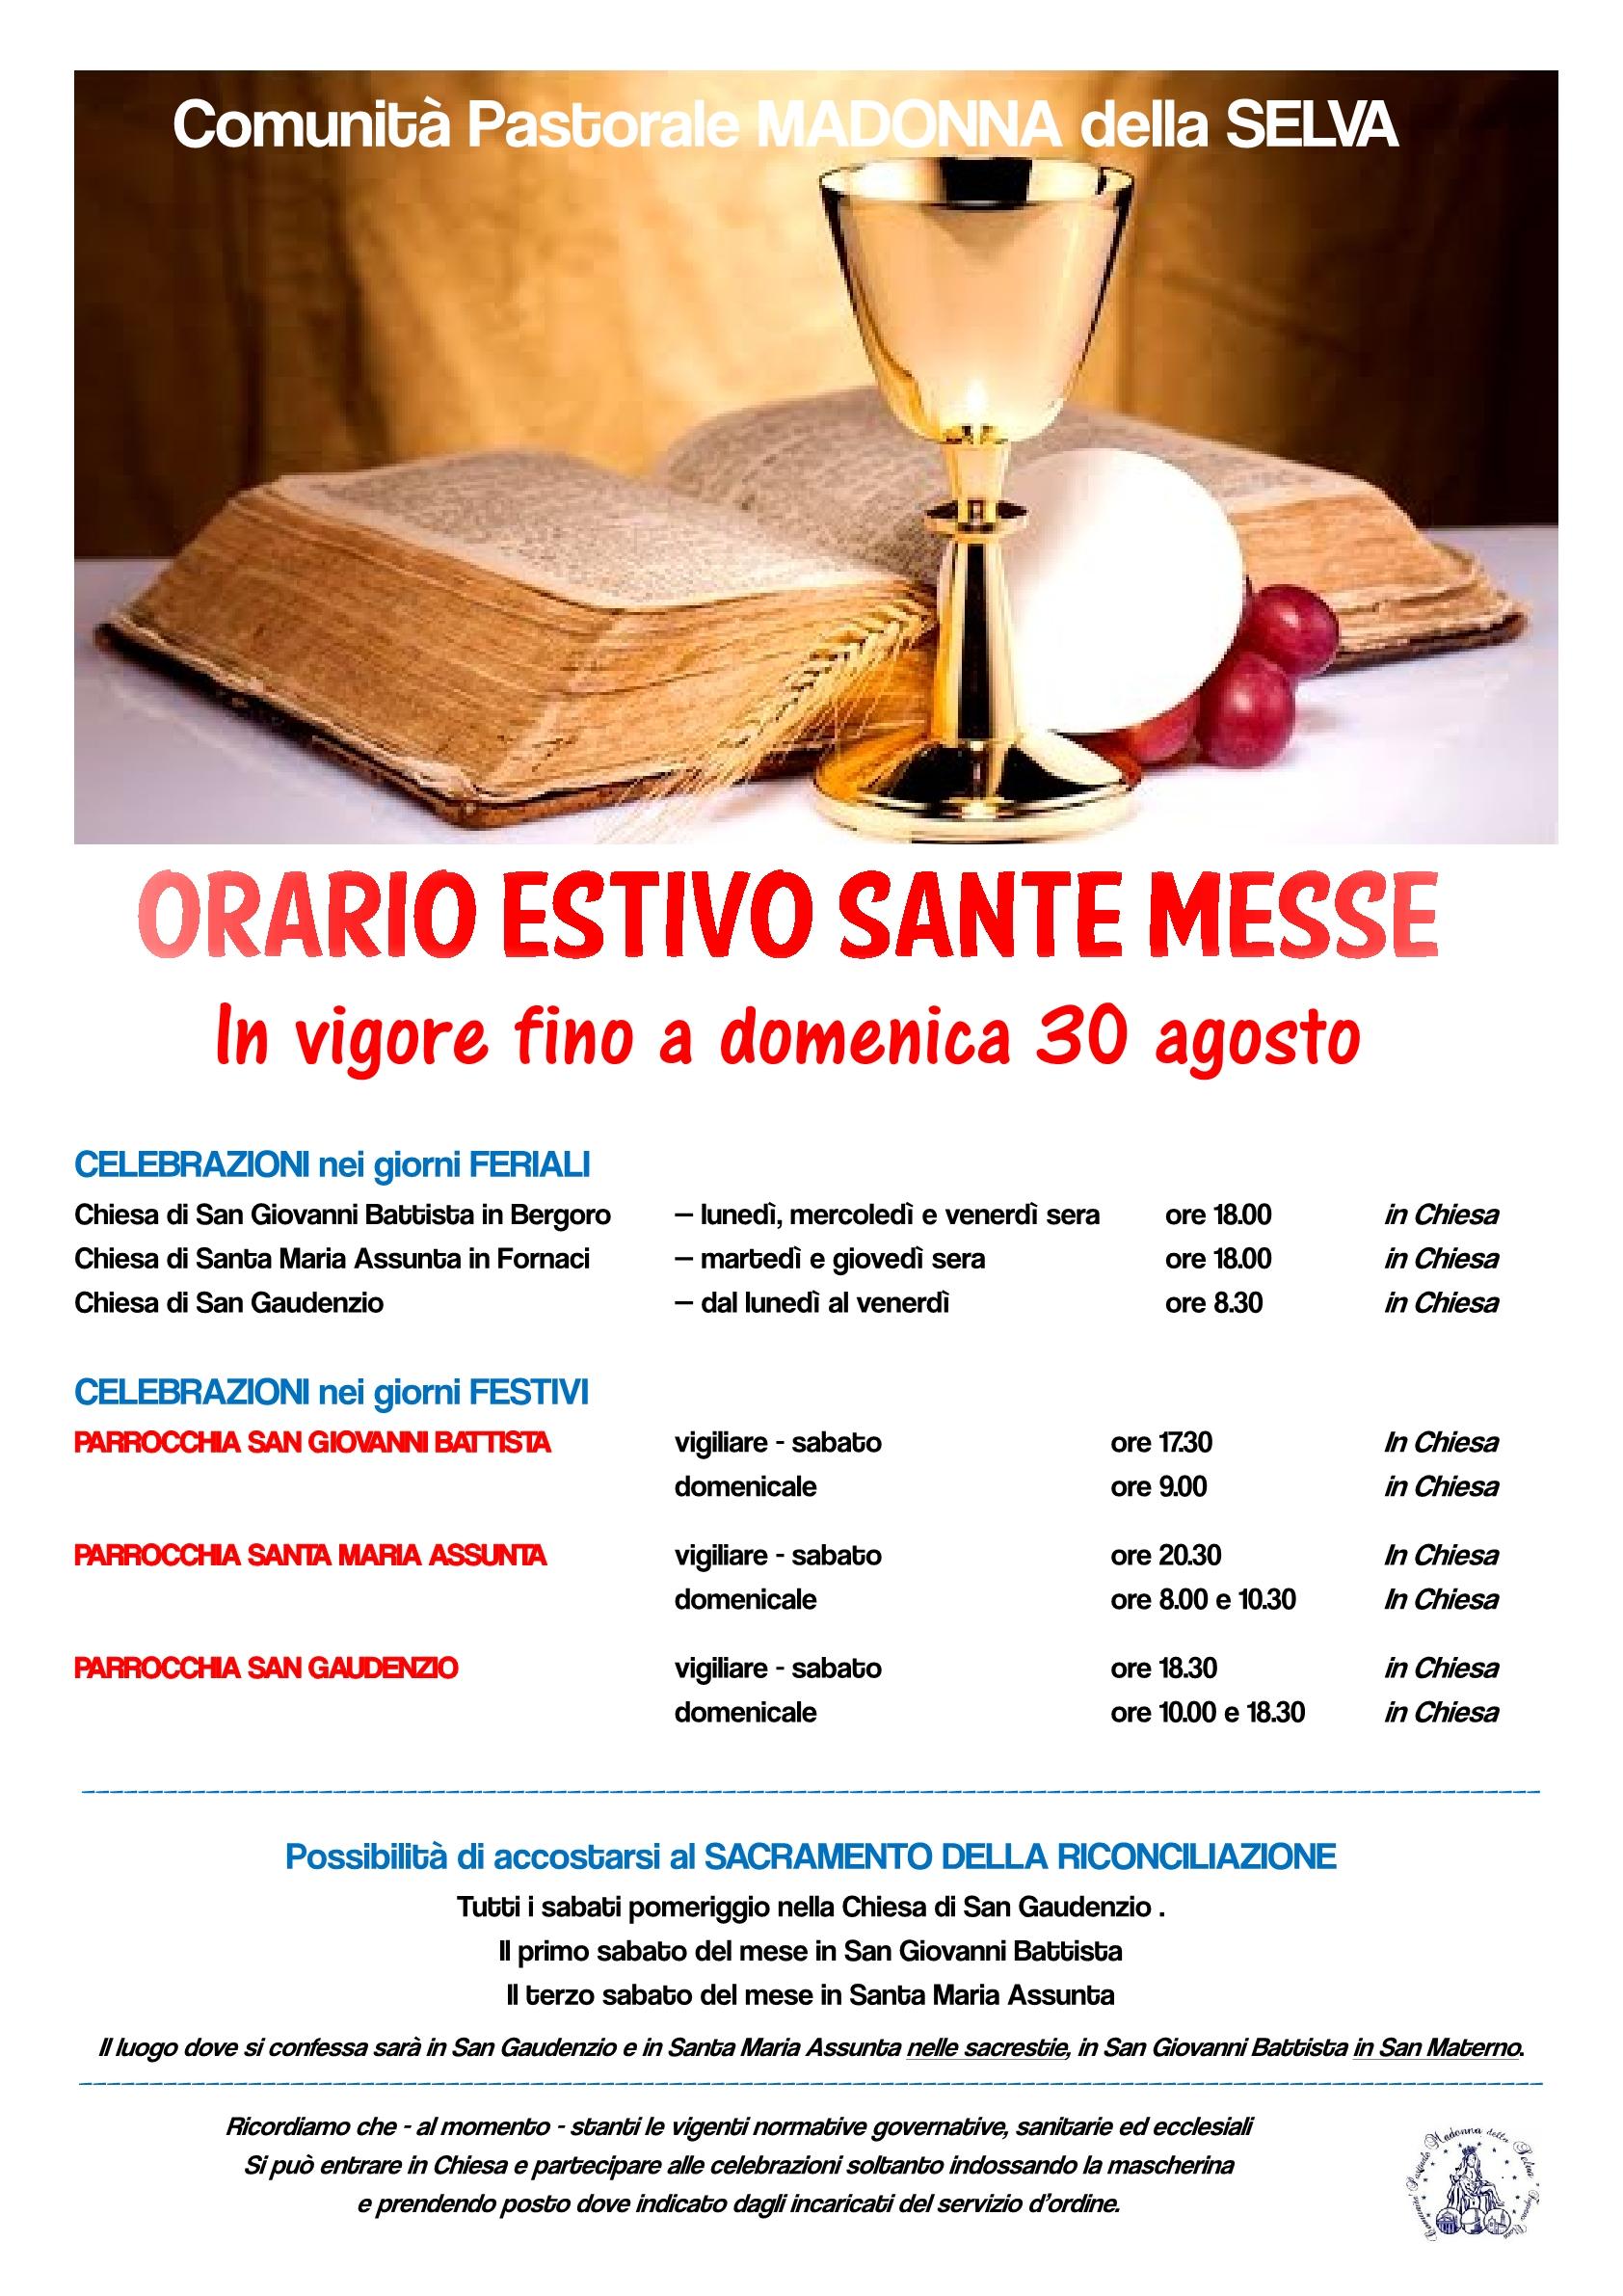 Volantino Messe orario estivo 20201